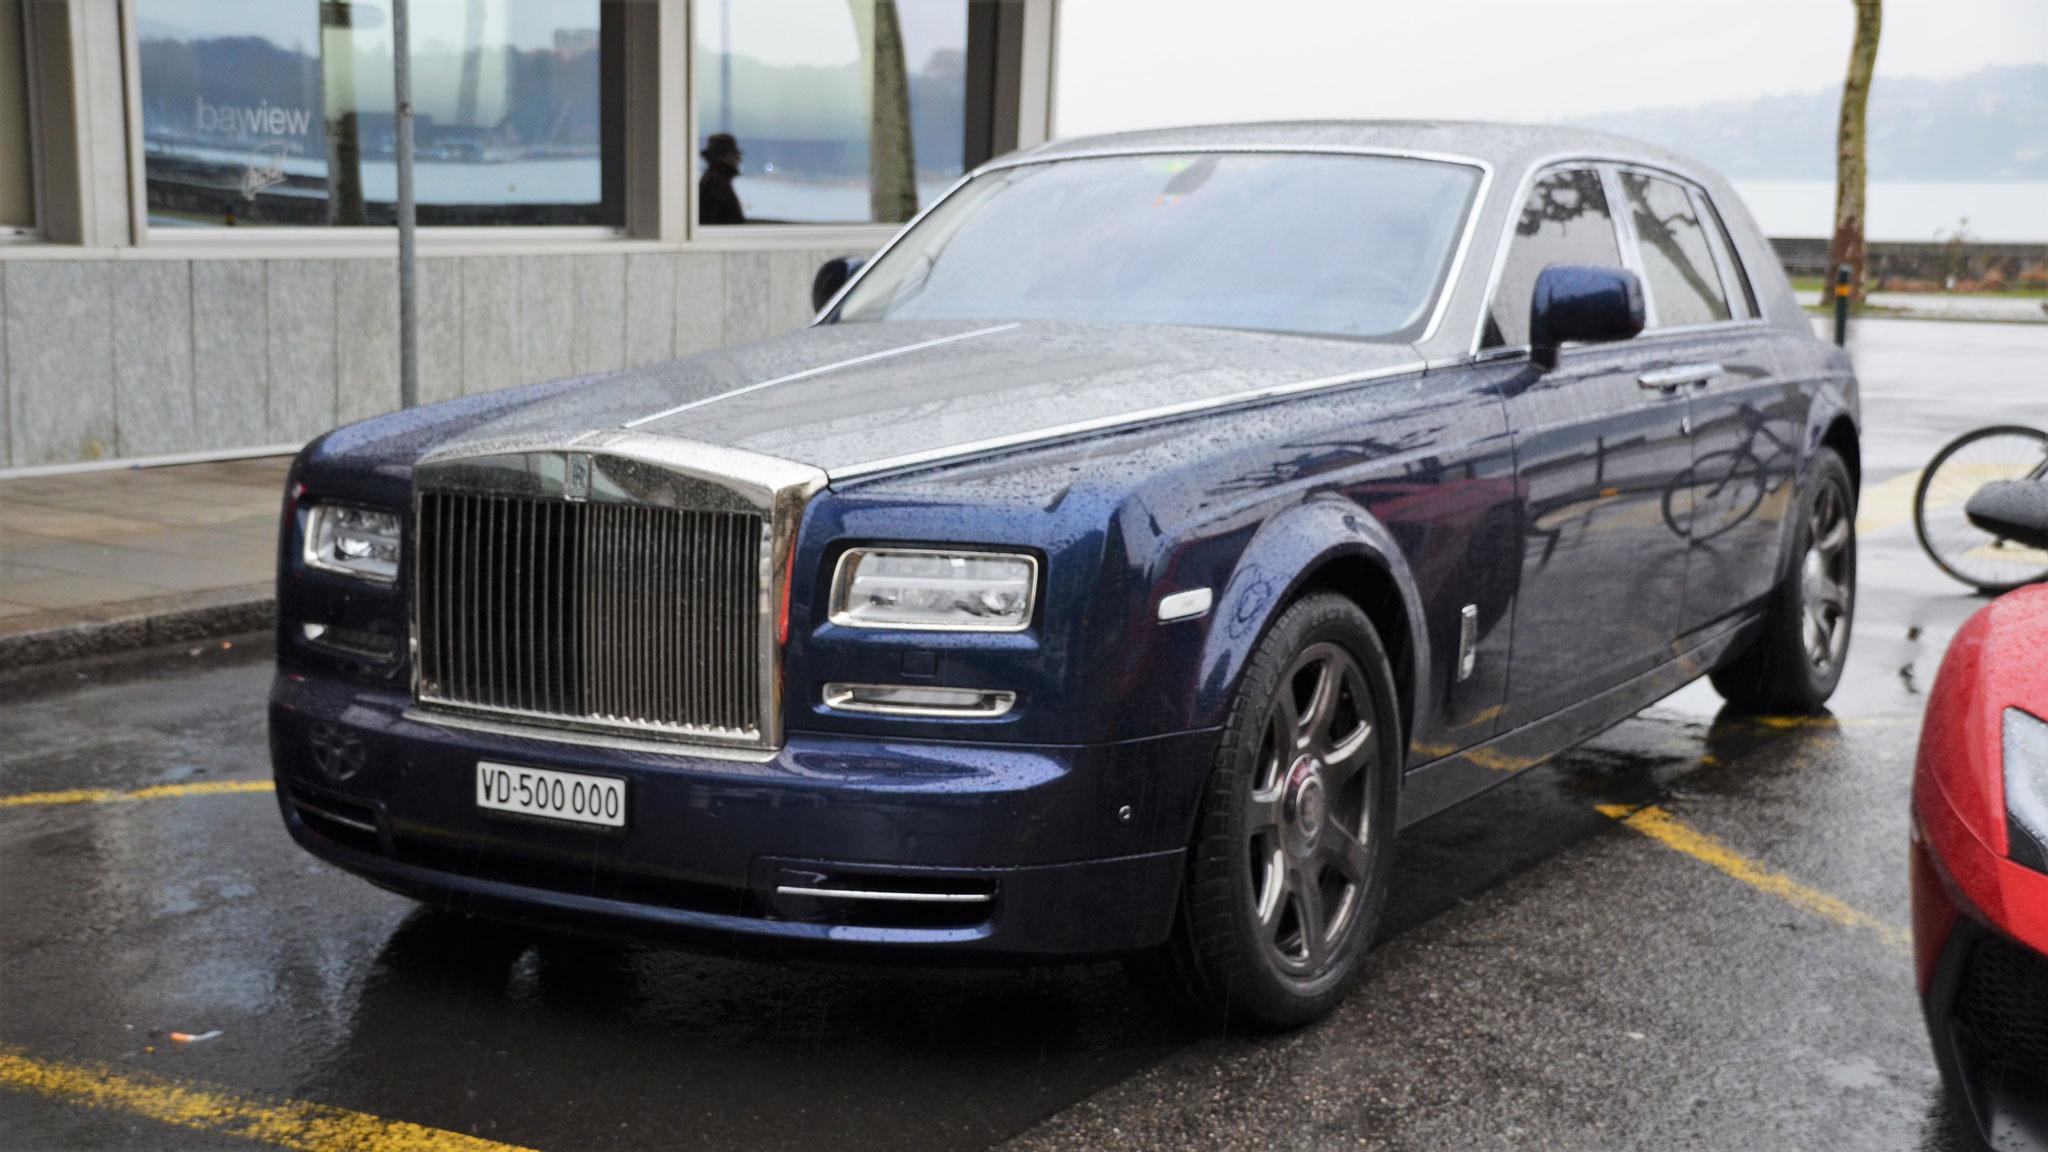 Rolls Royce Phantom - VD-500000 (CH)